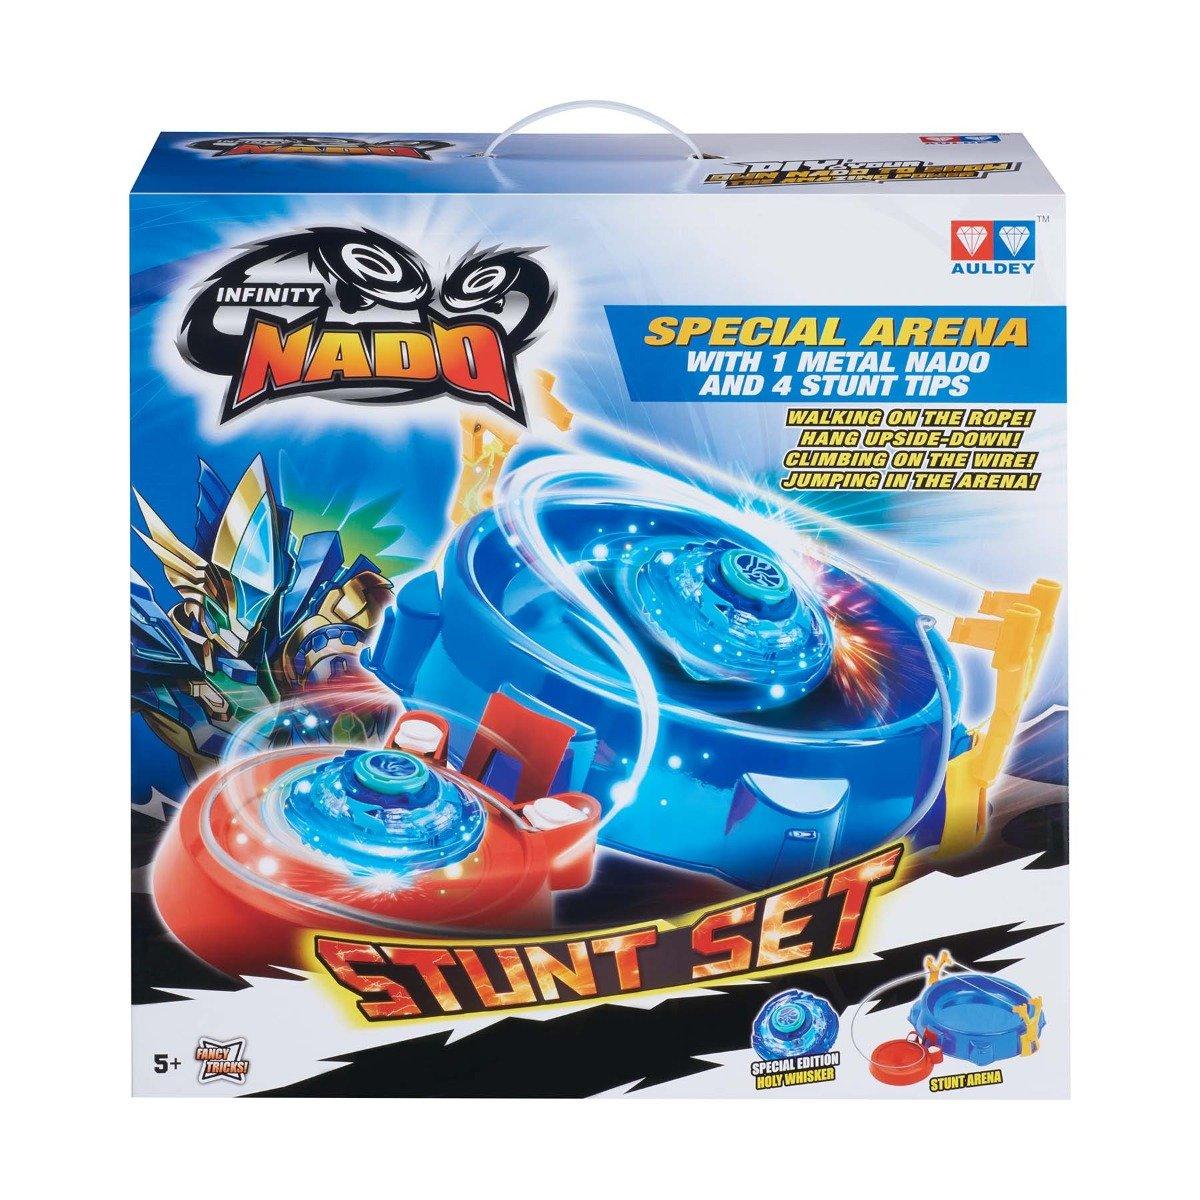 Set Spiner Infinity Nado - Stunt Special Arena